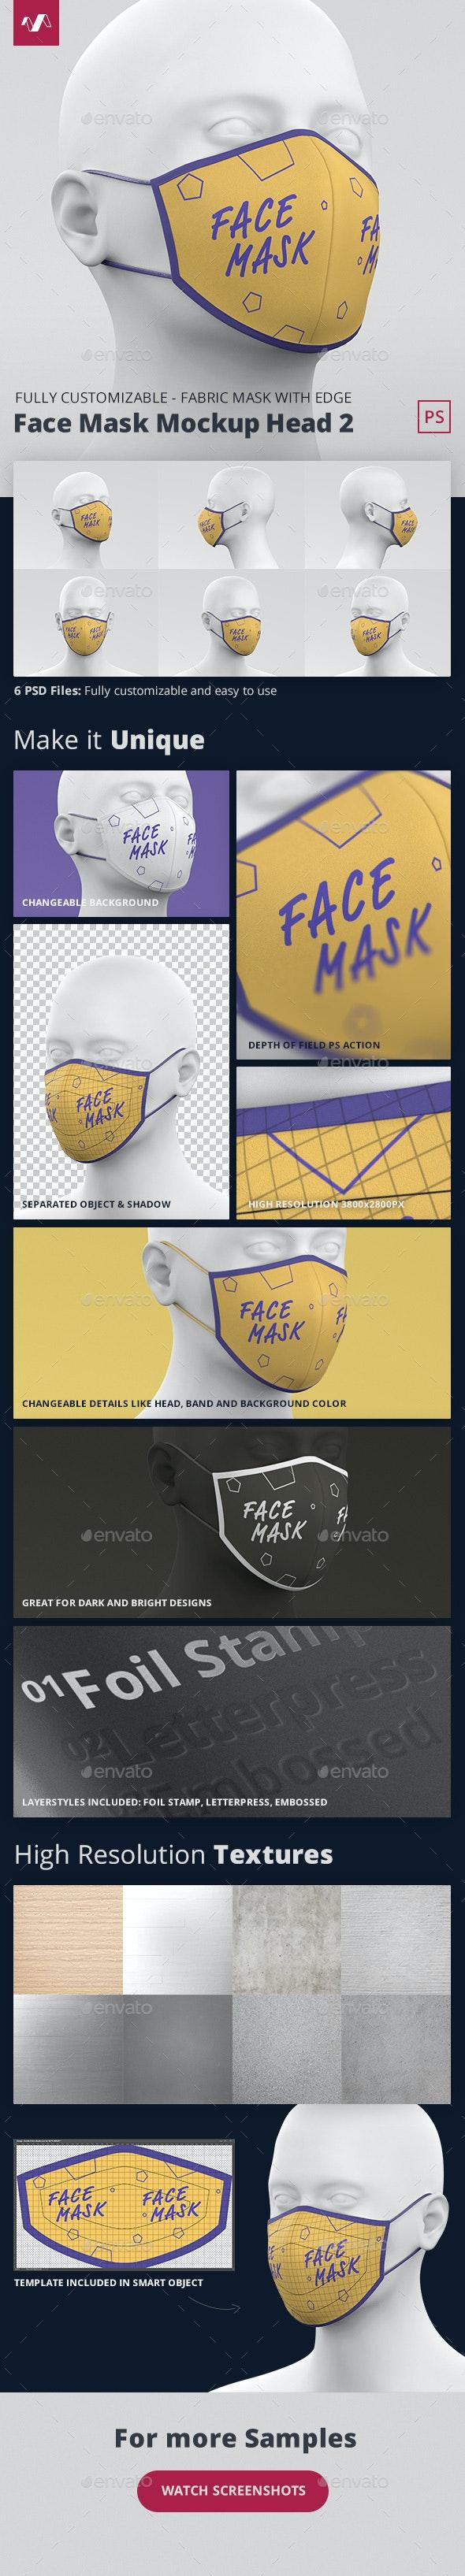 Face Mask Mockup Head Fabric 2 - Miscellaneous Apparel